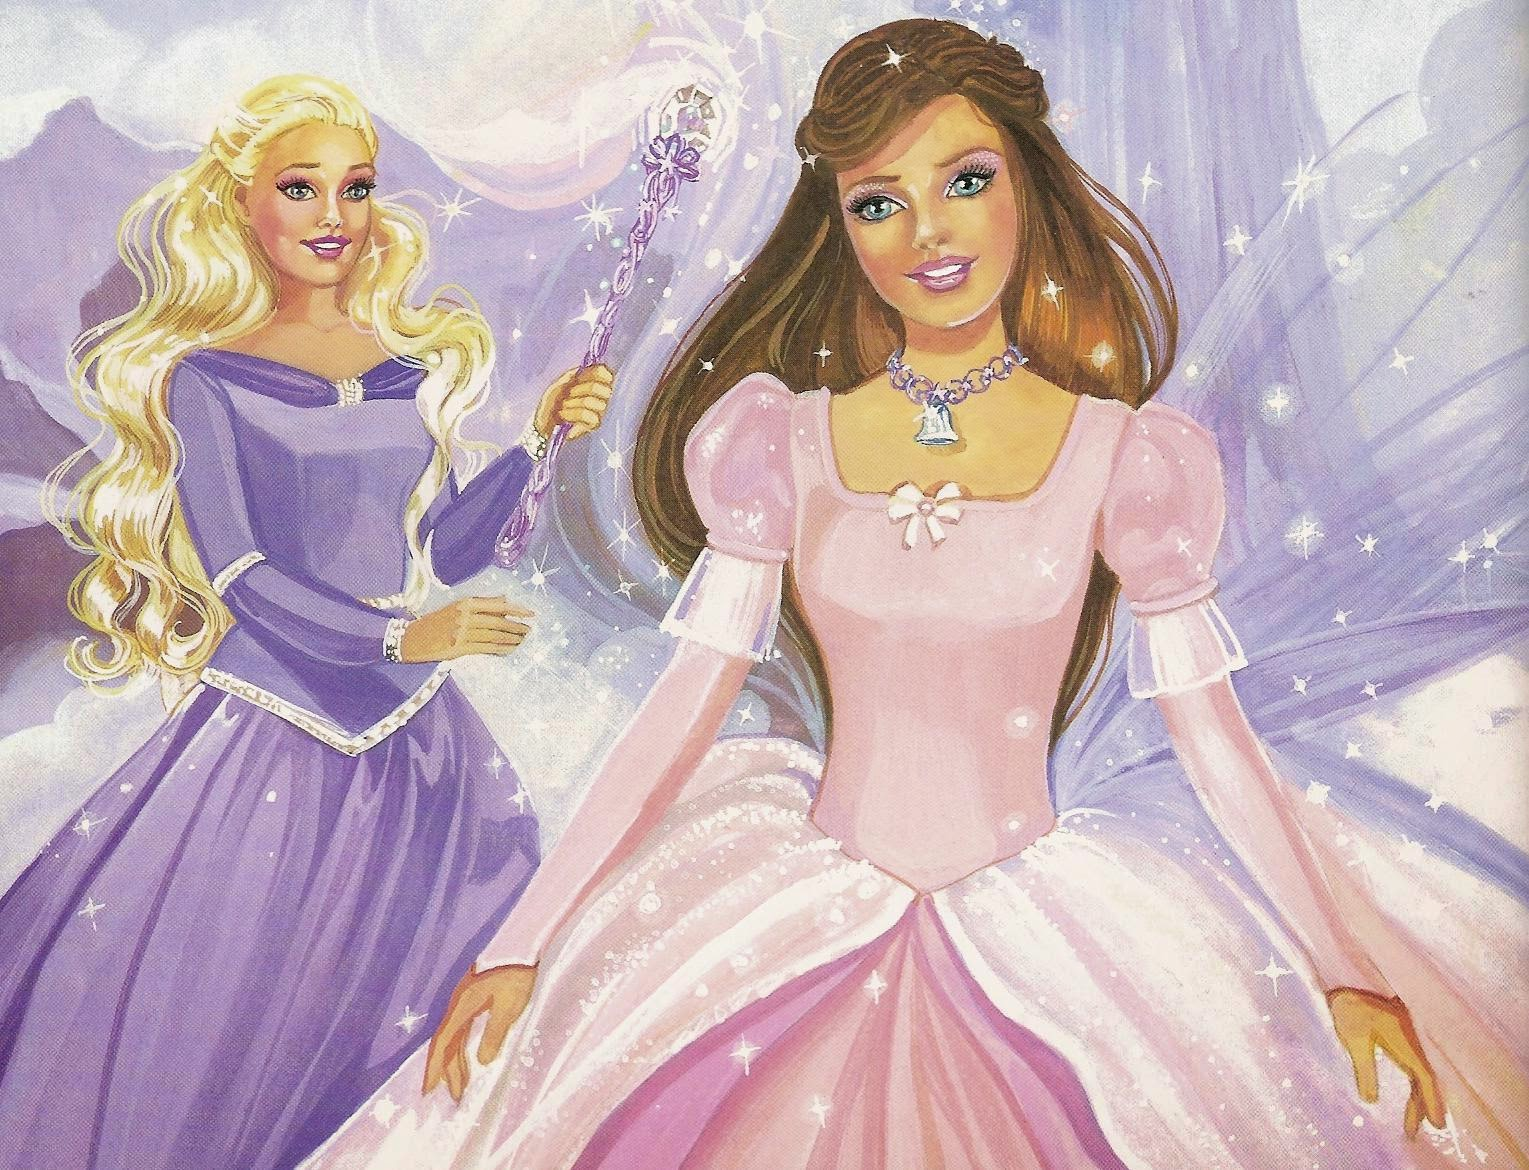 Jogos Para Meninas Jogo Barbie Magic Pegasus Online